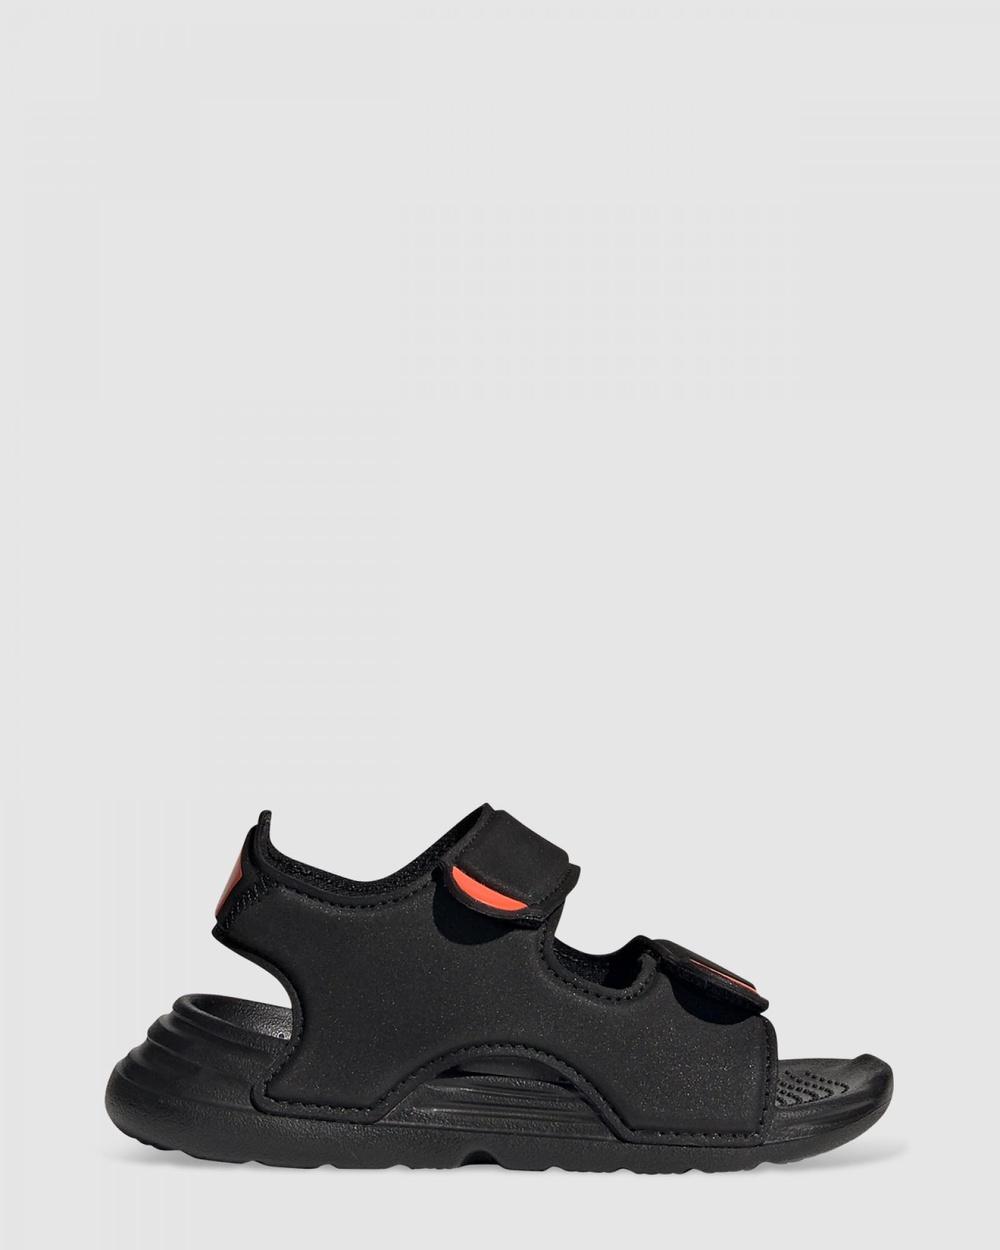 adidas Performance Swim Sandals Black